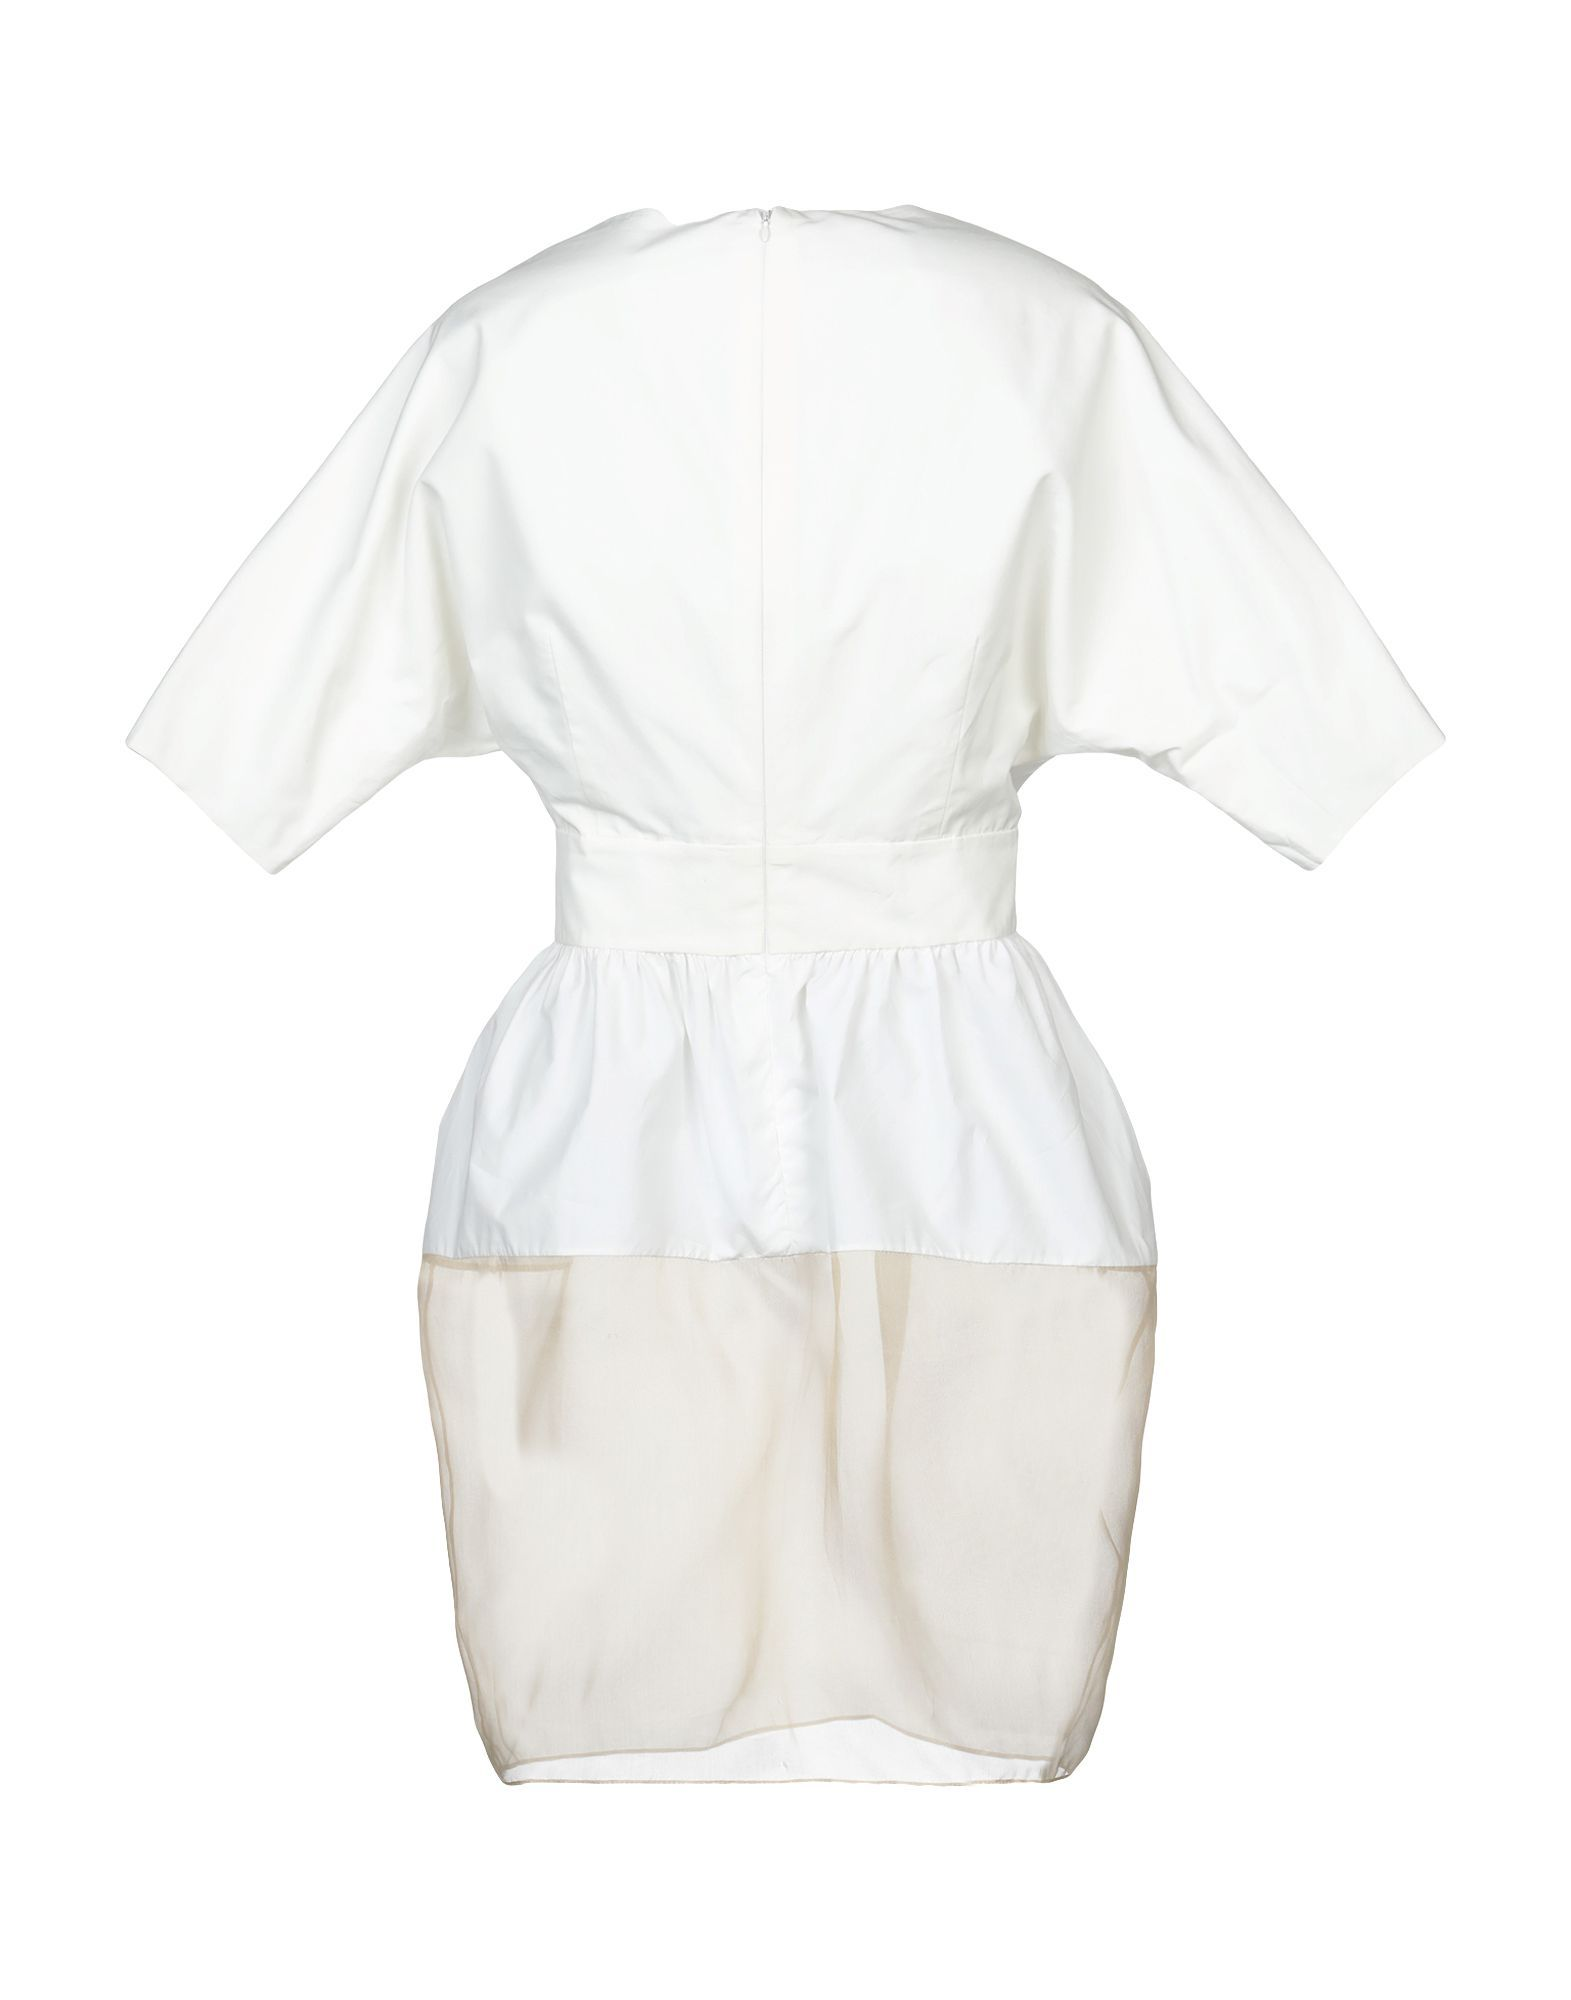 Giamba White Organza Short Sleeve Shirt